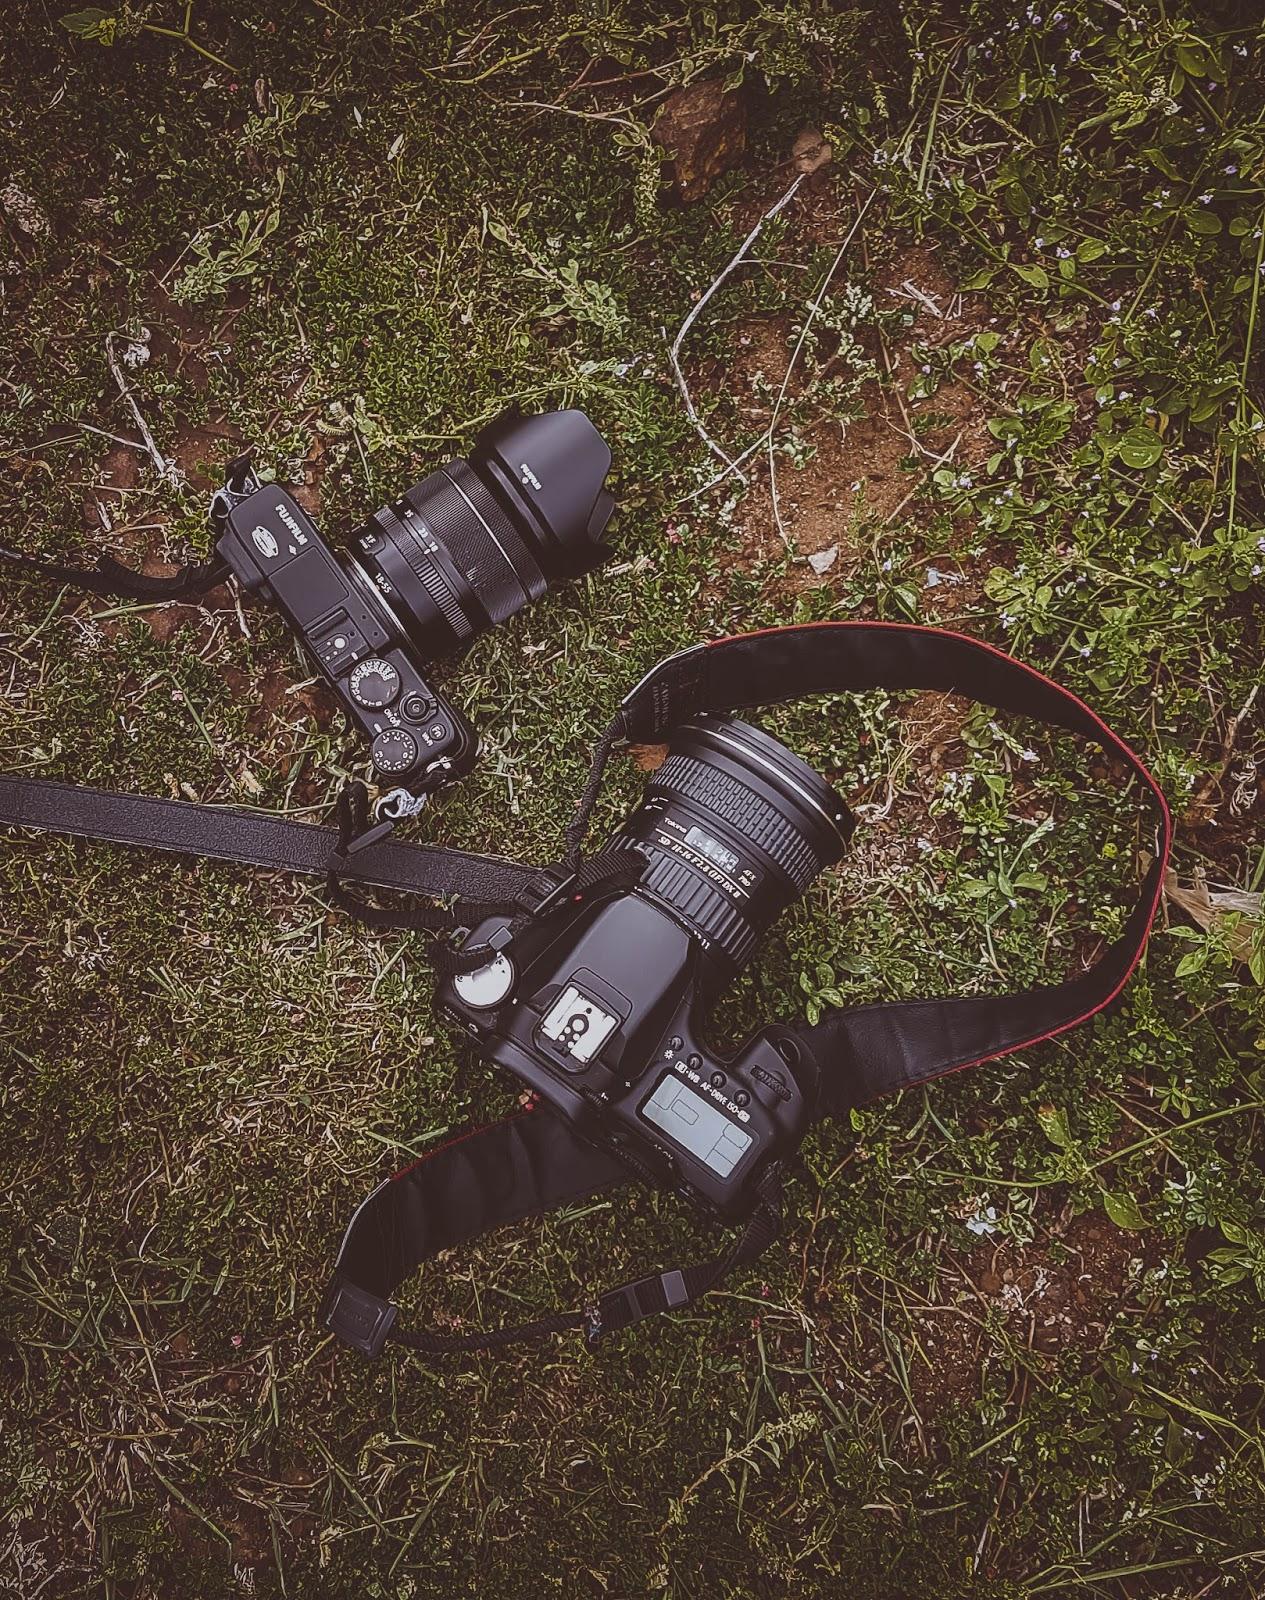 My Gear - Fuji XE-2 & Canon 50D + Tokina 11-16 mm F2.8 Ultra Wide Lens